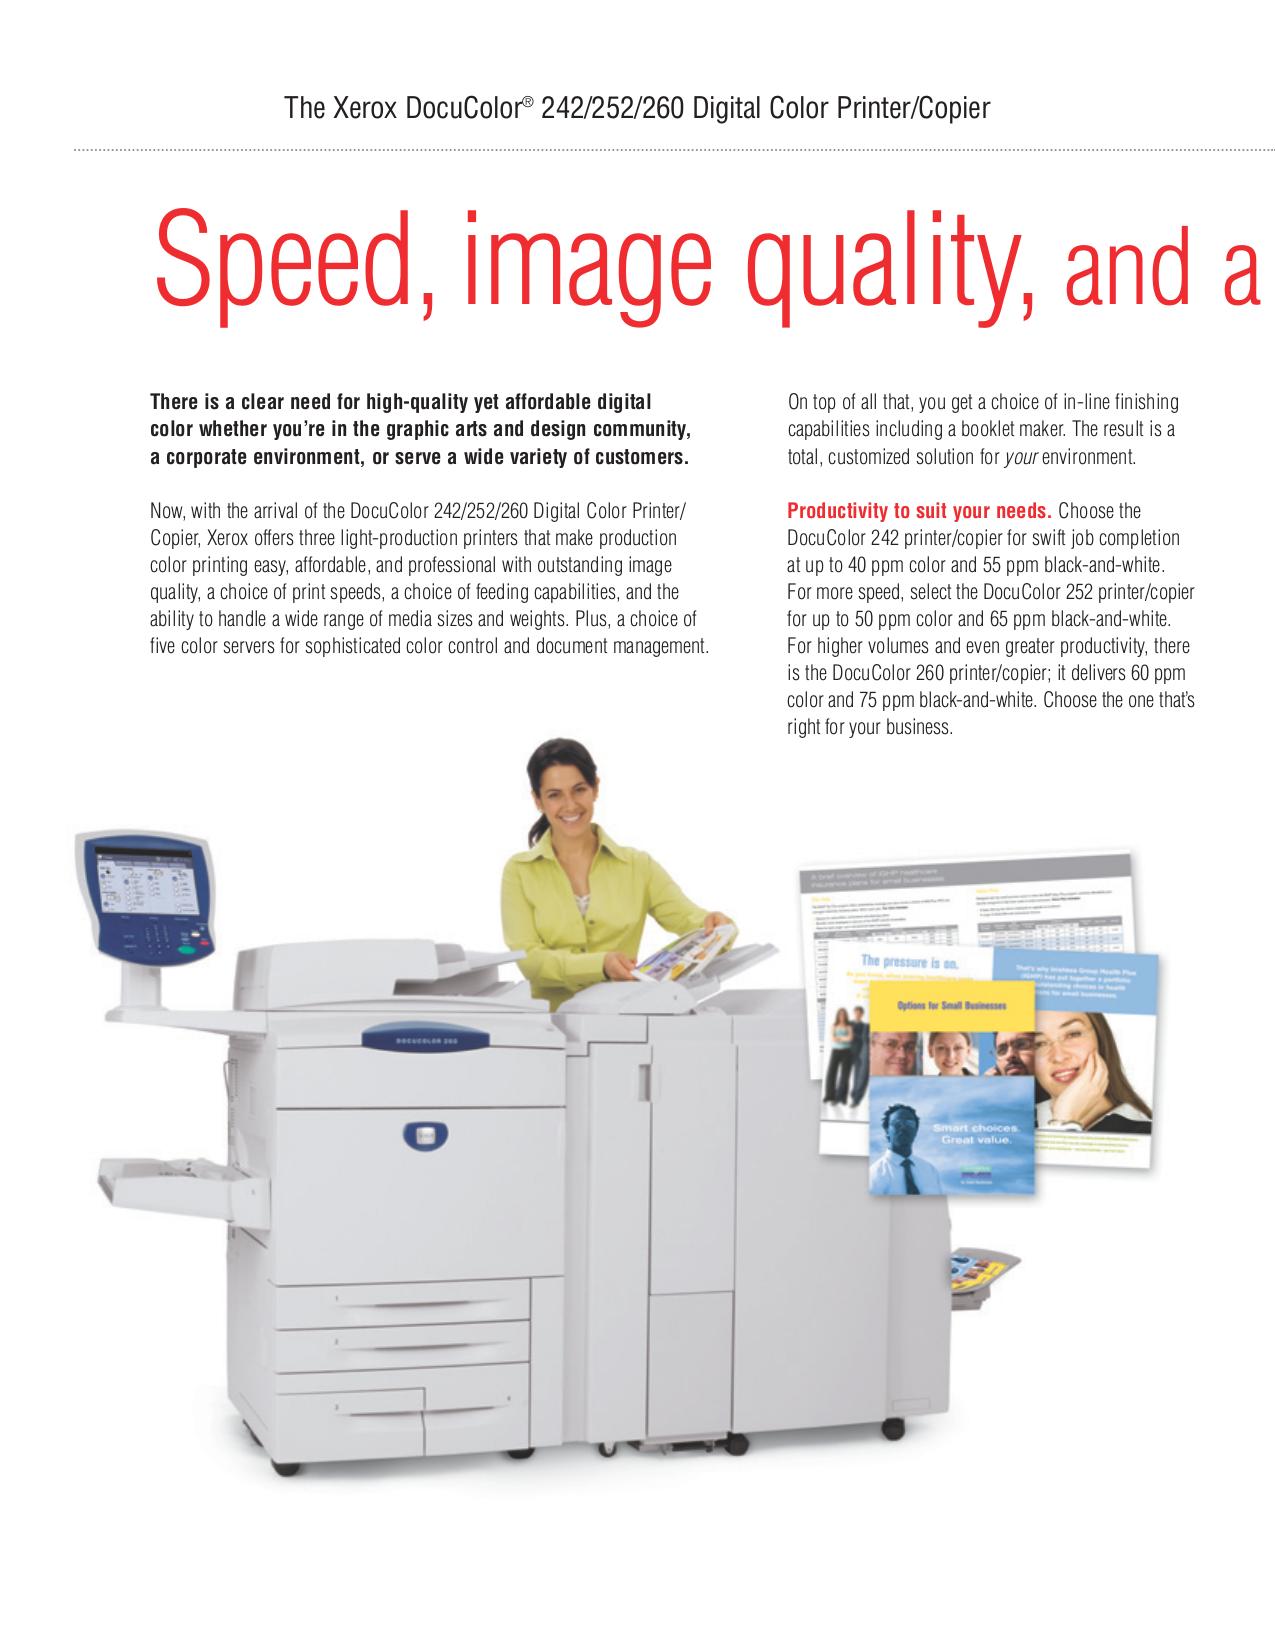 xerox docucolor 252 manual pdf